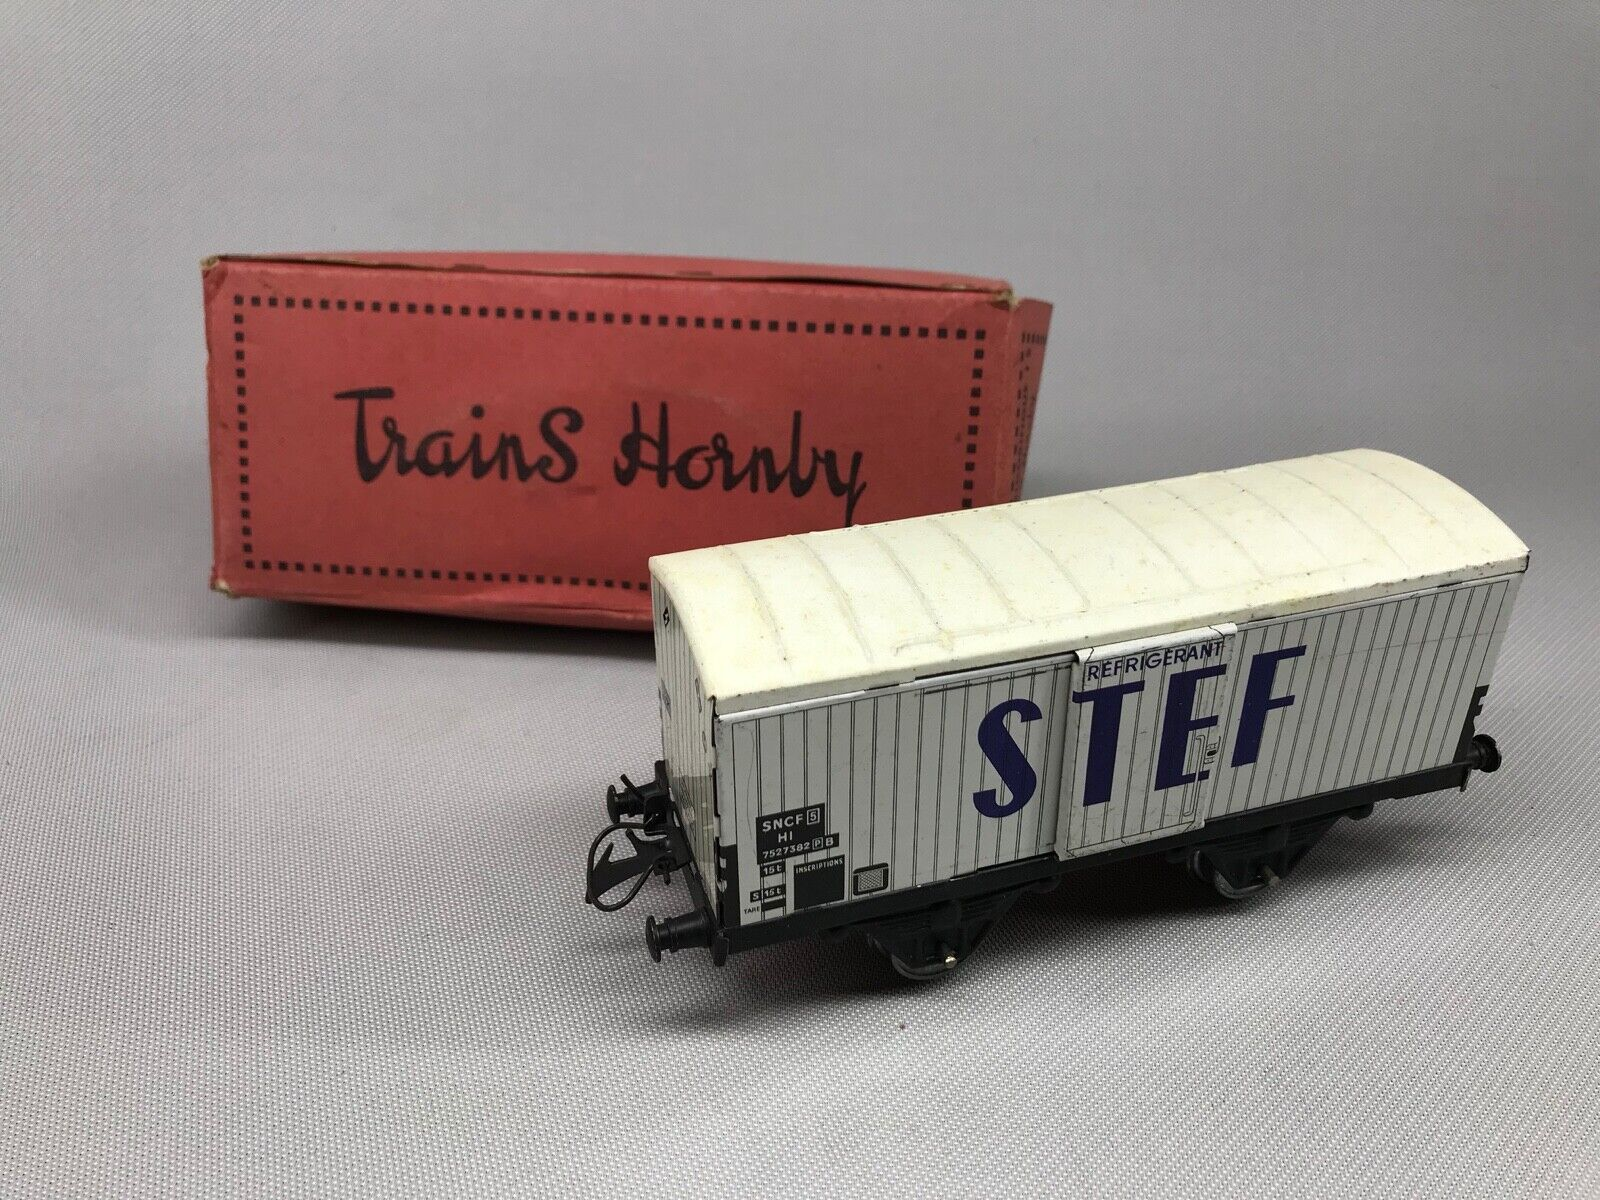 Waggon Kühlkoffer I S, Zug Hornby, Spur O Güterwagen Komplett Spiel Antik Box